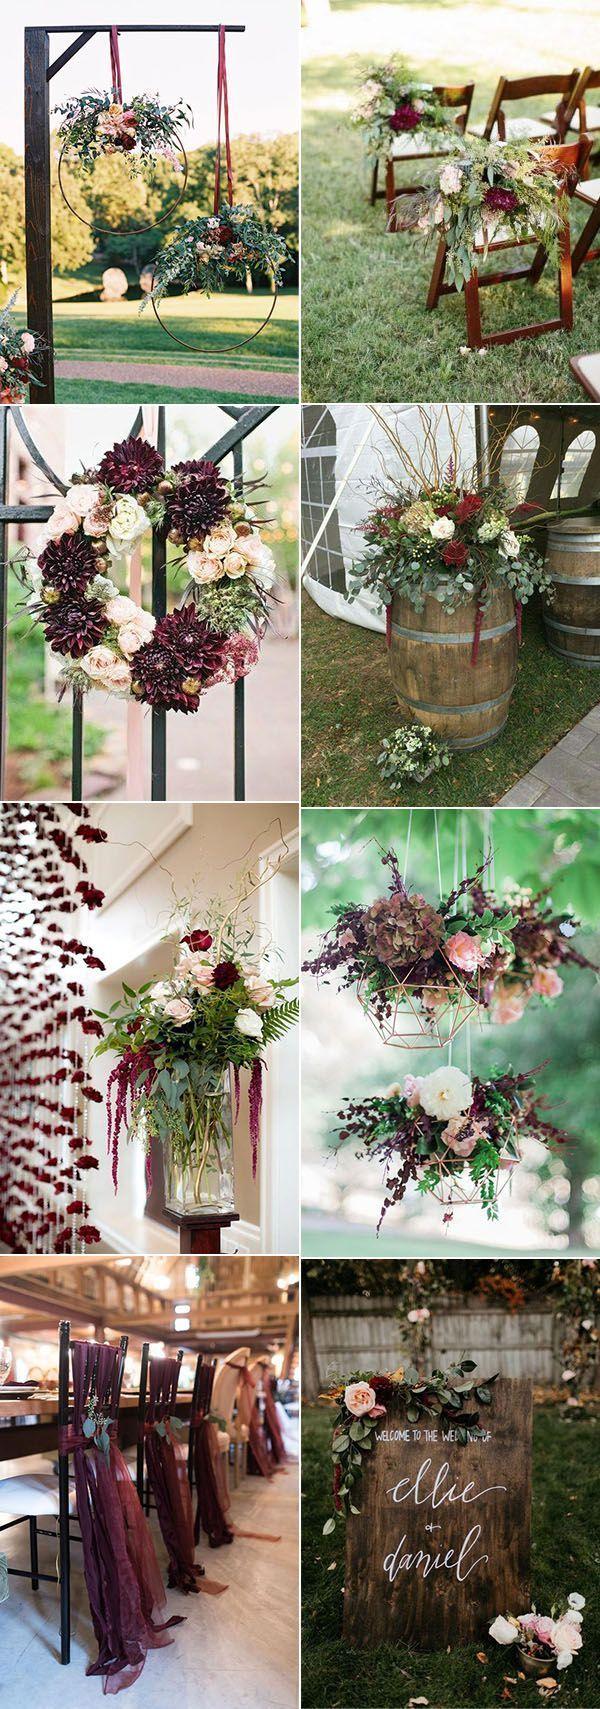 Ideas of wedding decorations  creative burgundy and marsala fall wedding decoration ideas  Bodas